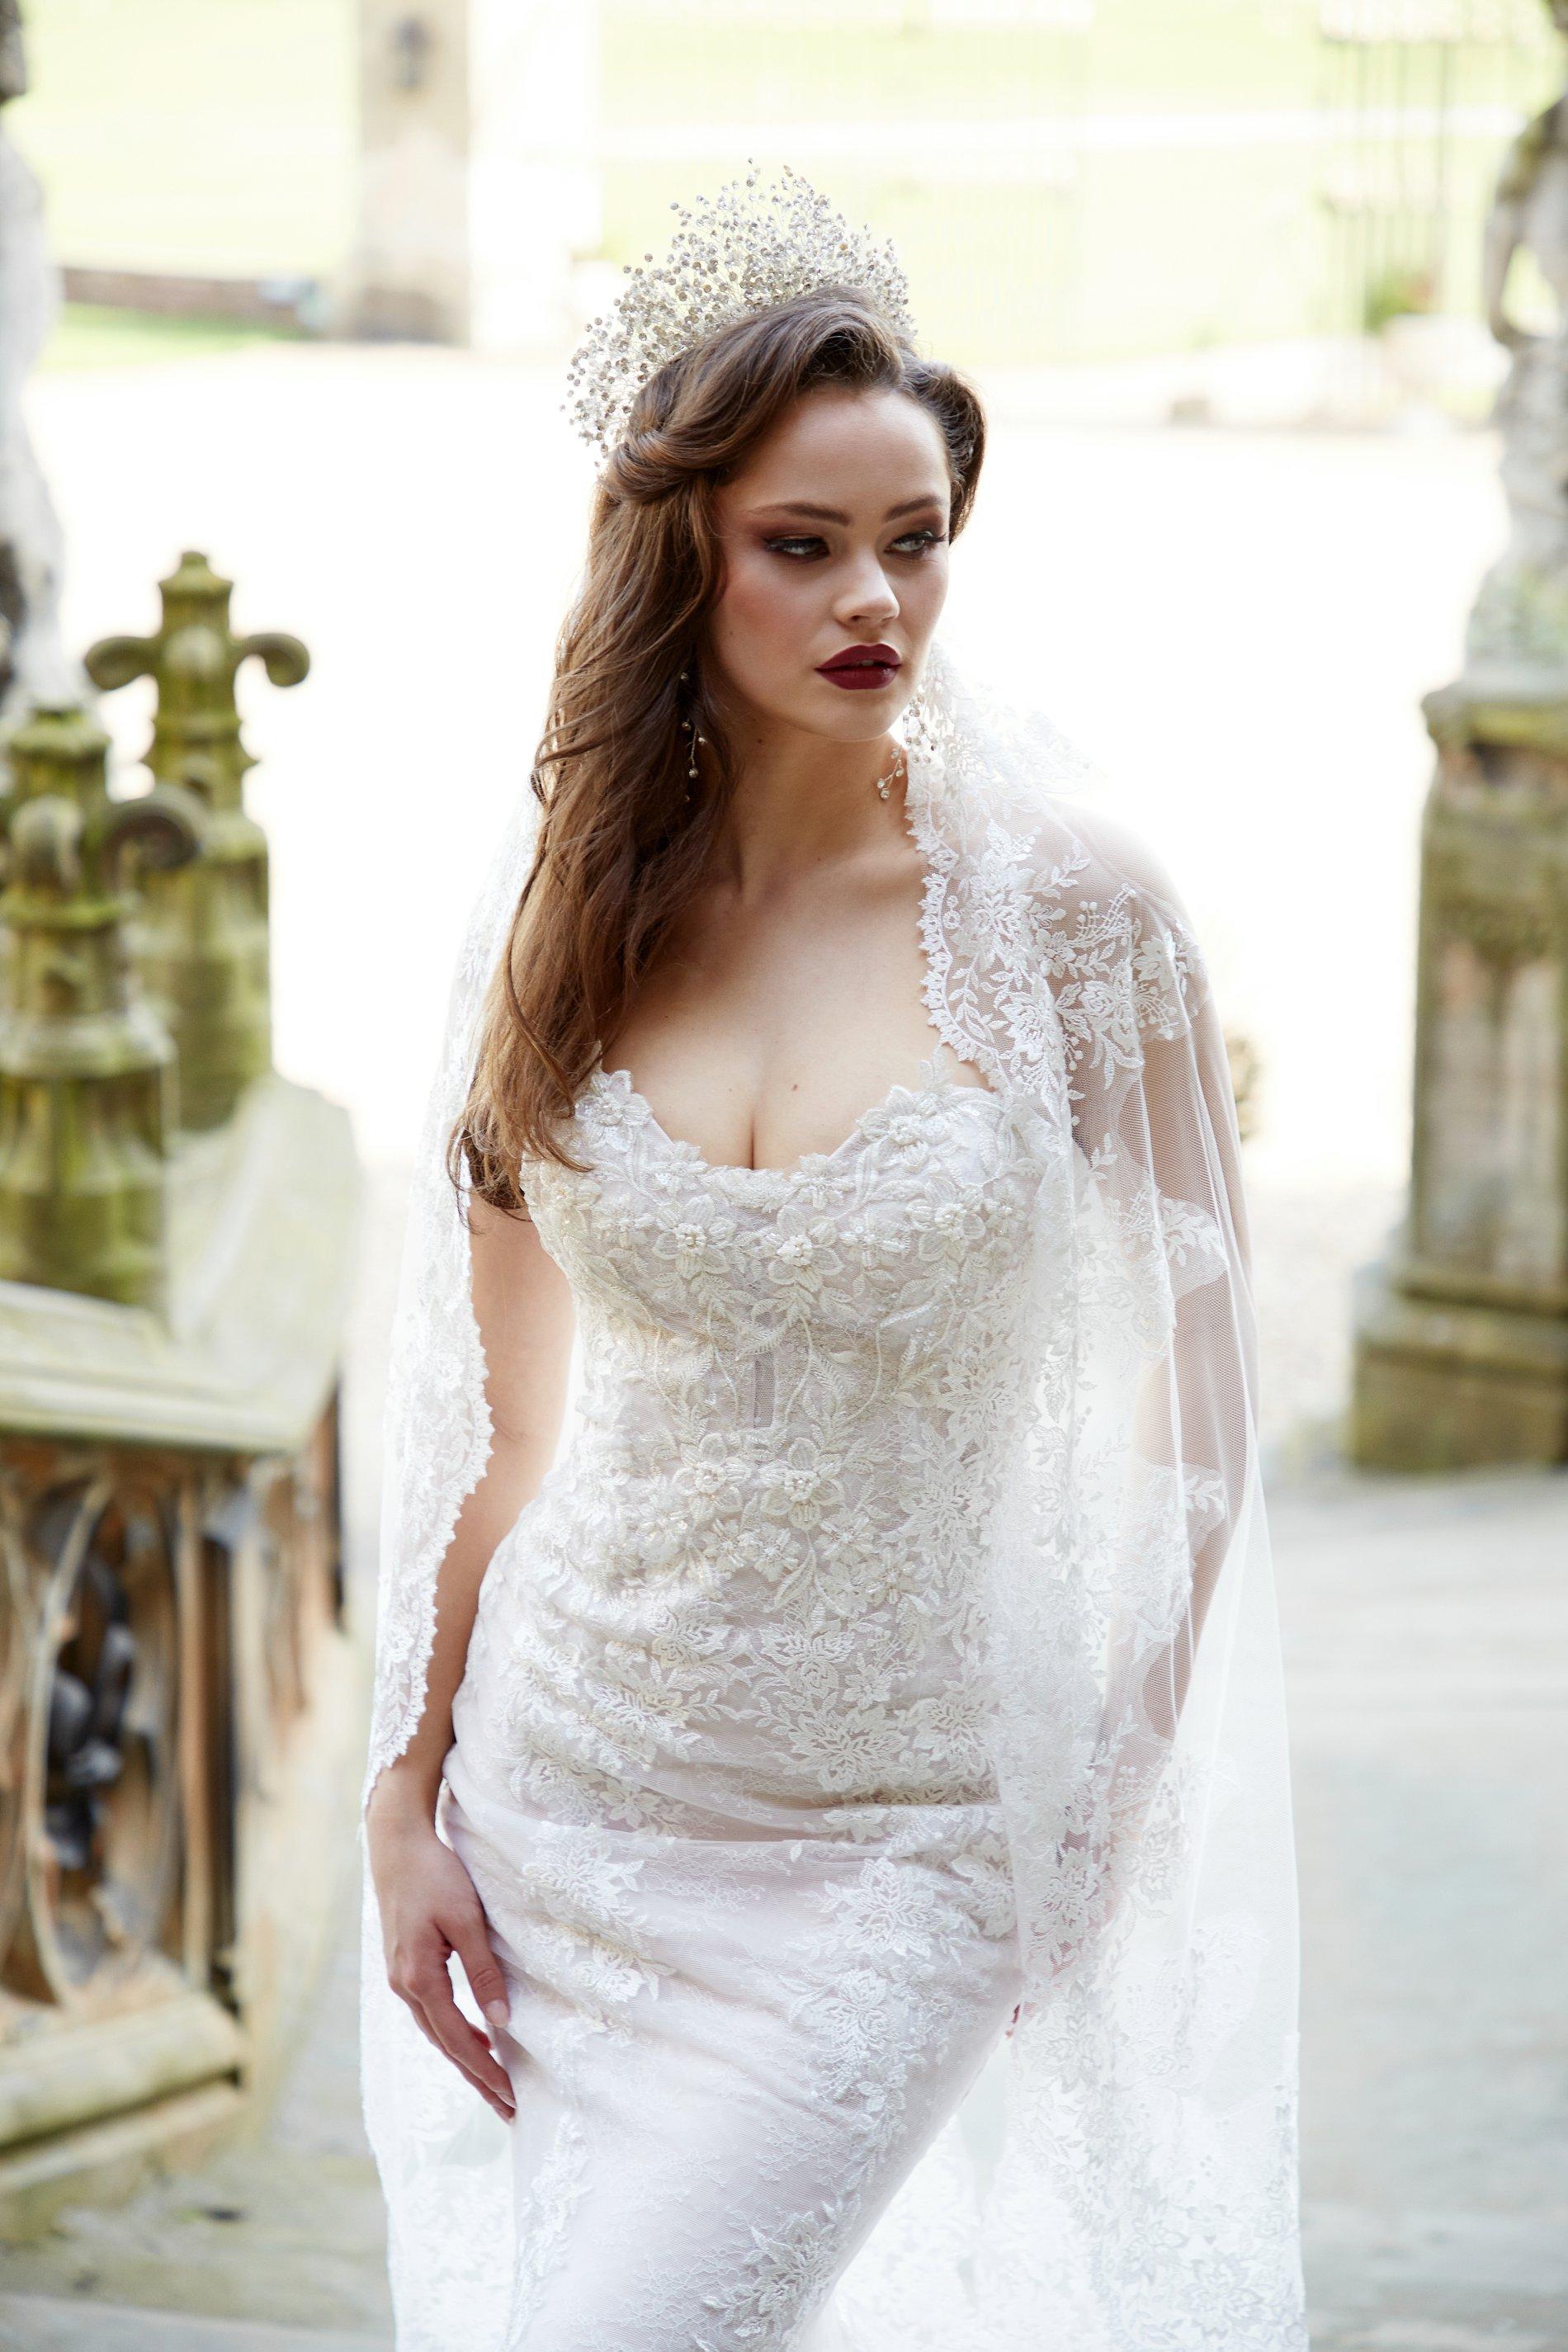 Danielle Sykes Bridal Designs (24)